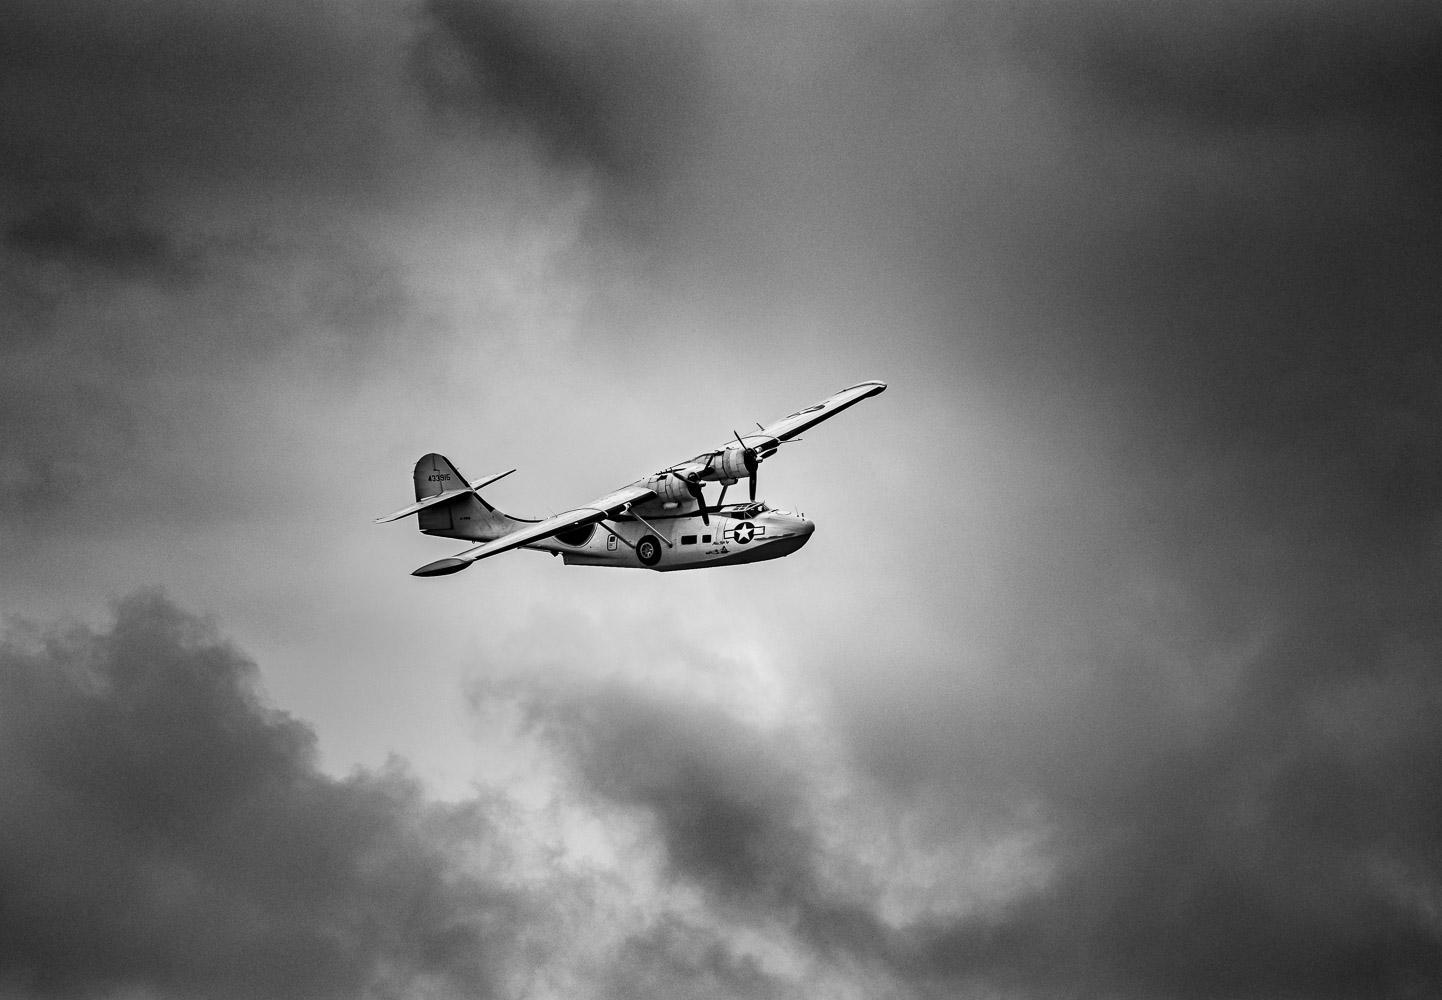 roskilde-airshow-catalina-2.jpg